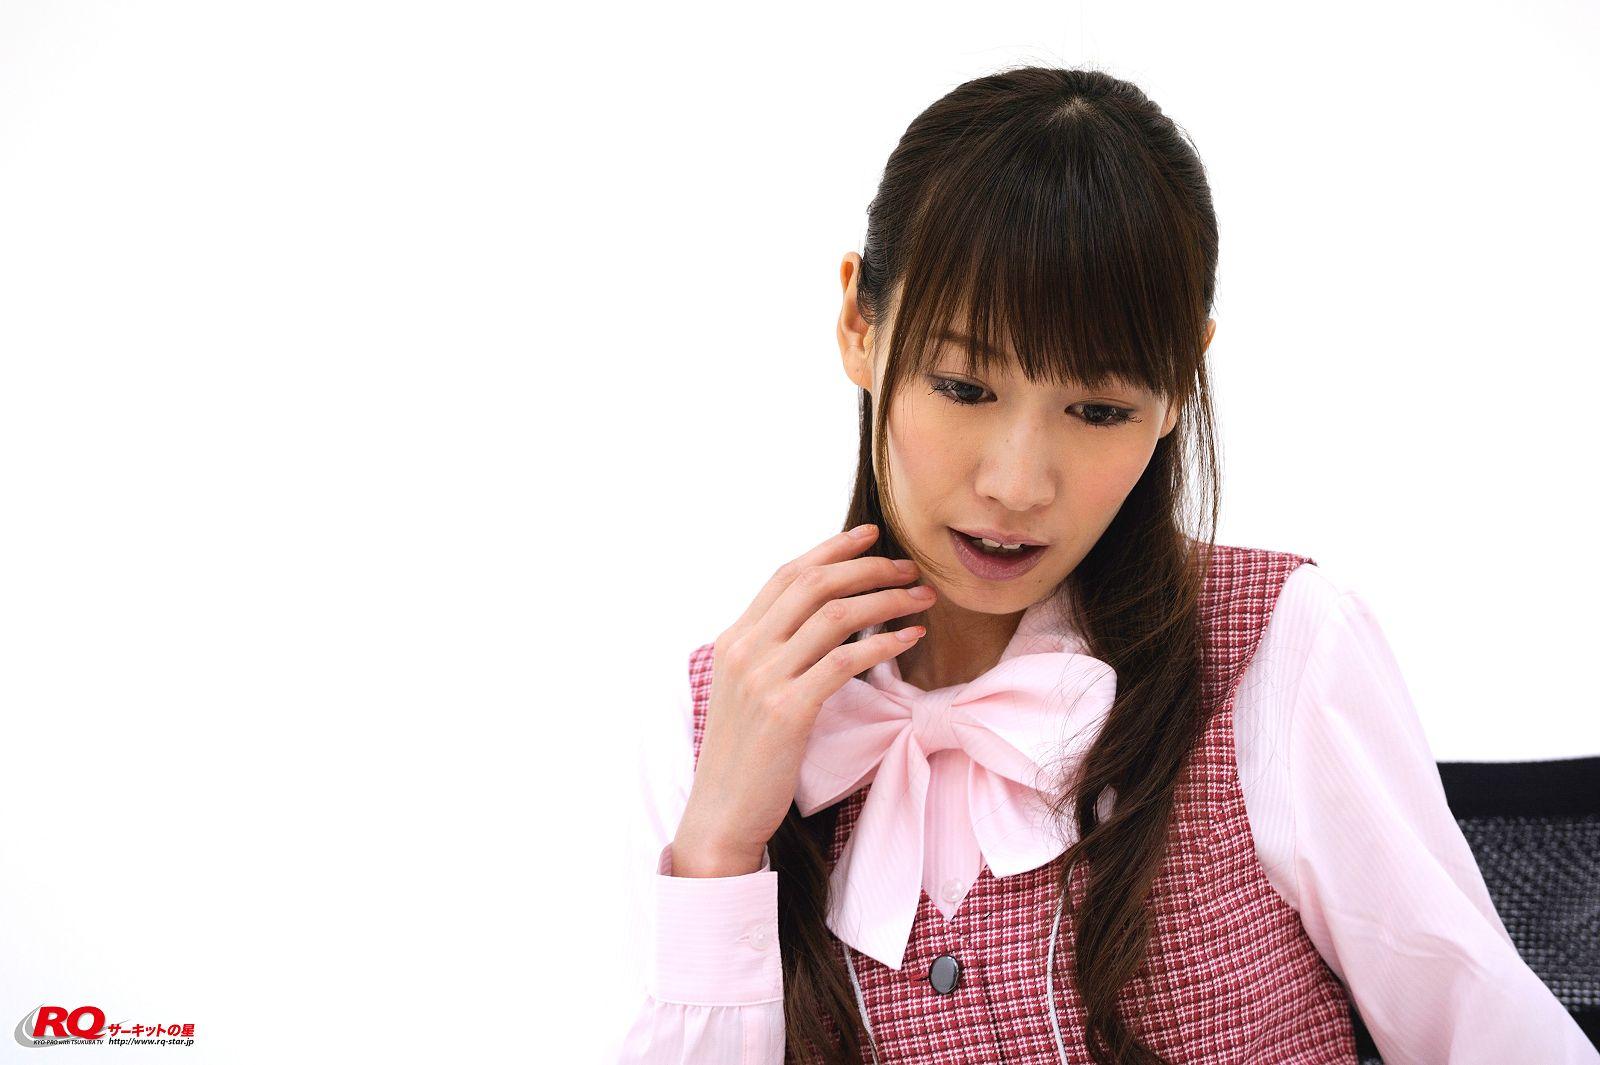 [RQ STAR美女] NO.0114 Rina Yamamoto 山本里奈 Office Lady[68P] RQ STAR 第1张